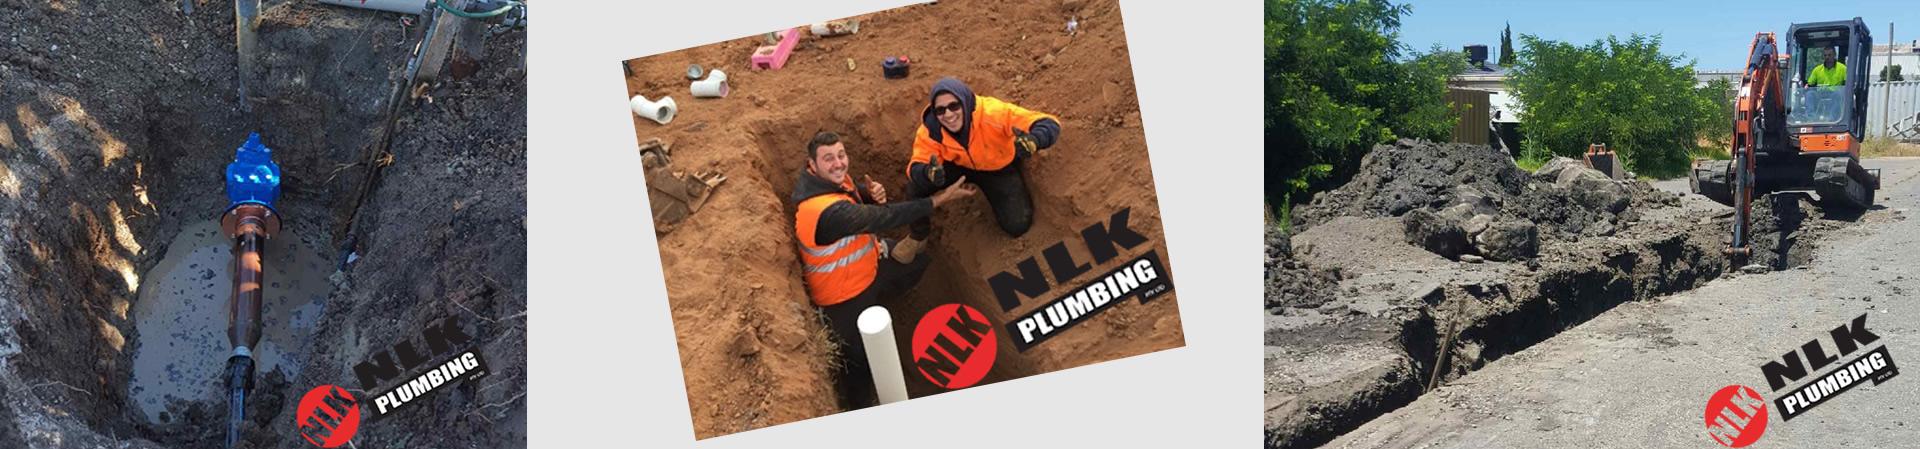 5 Plumbing Techniques for Weekend Break Plumbers Melbourne